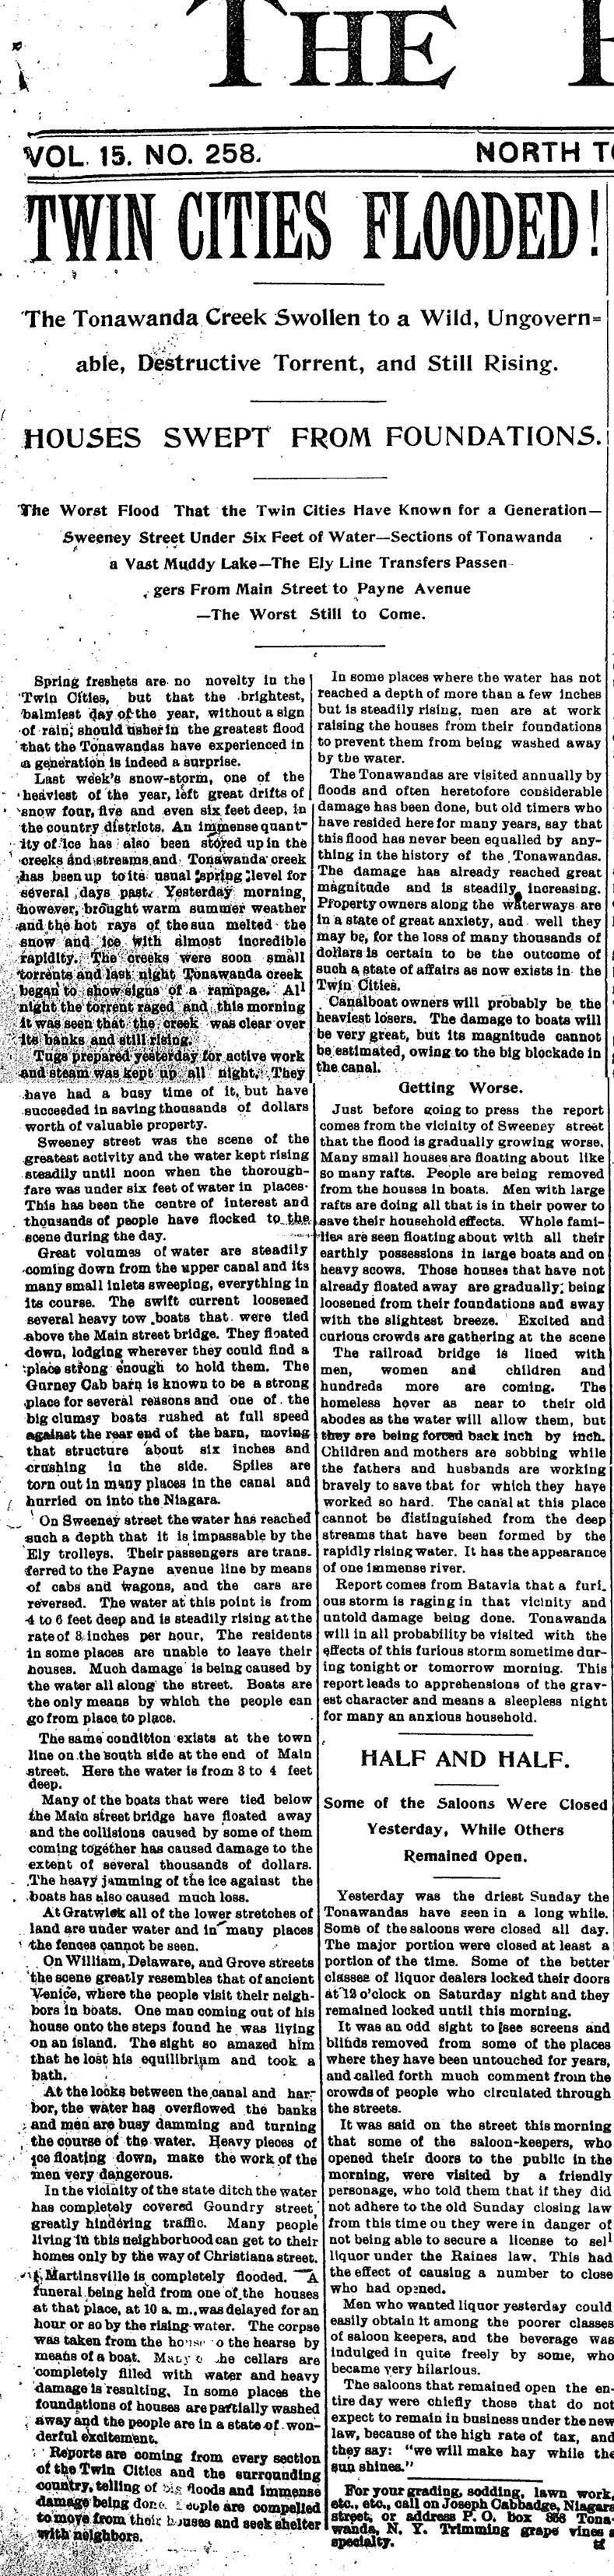 Twin Cities Flooded, article (Tonawanda News, 1896-03-30).jpg